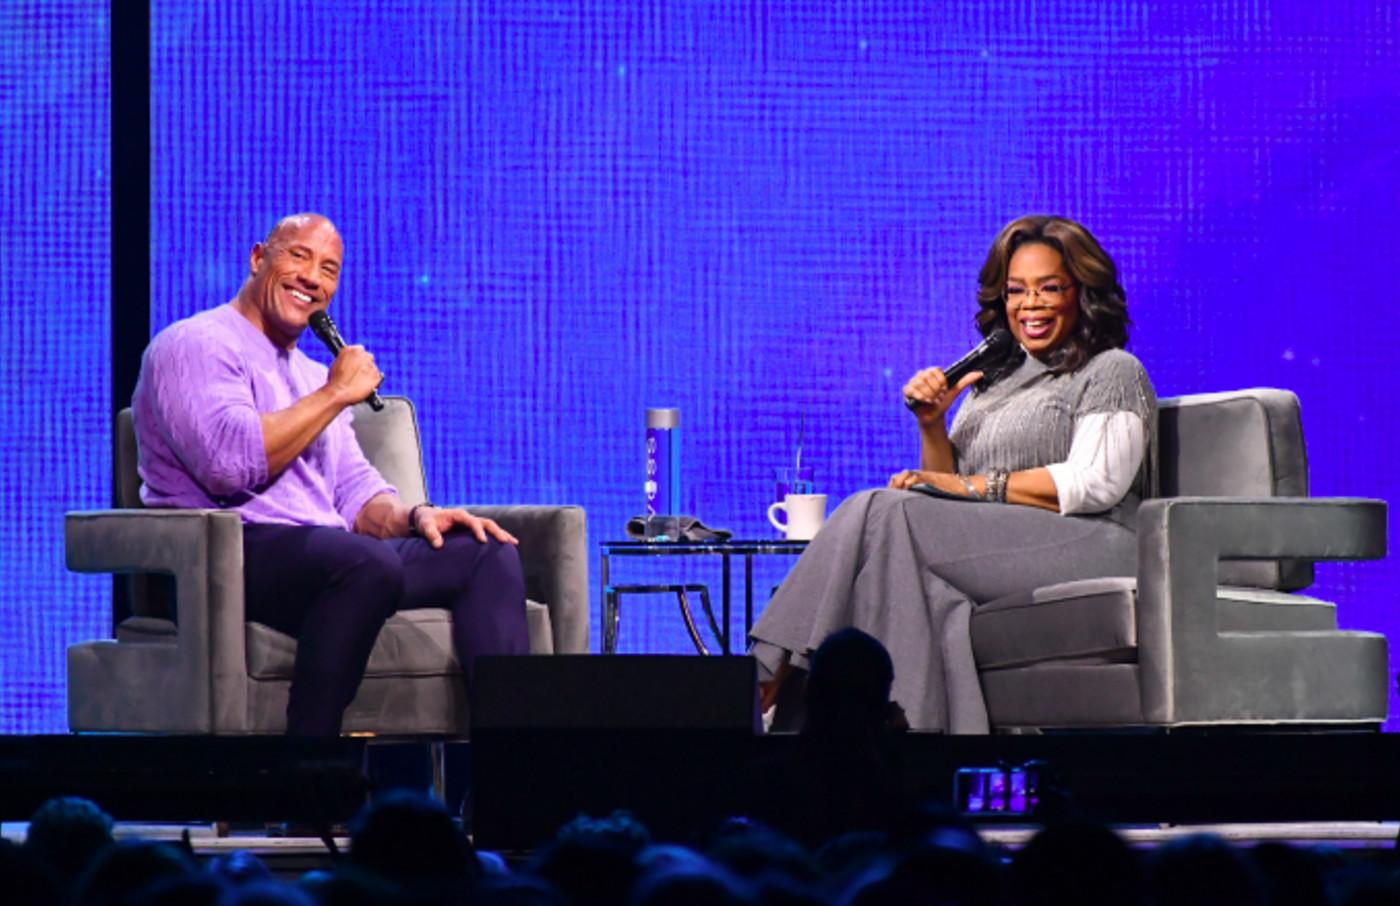 Dwayne Johnson and Oprah Winfrey onstage